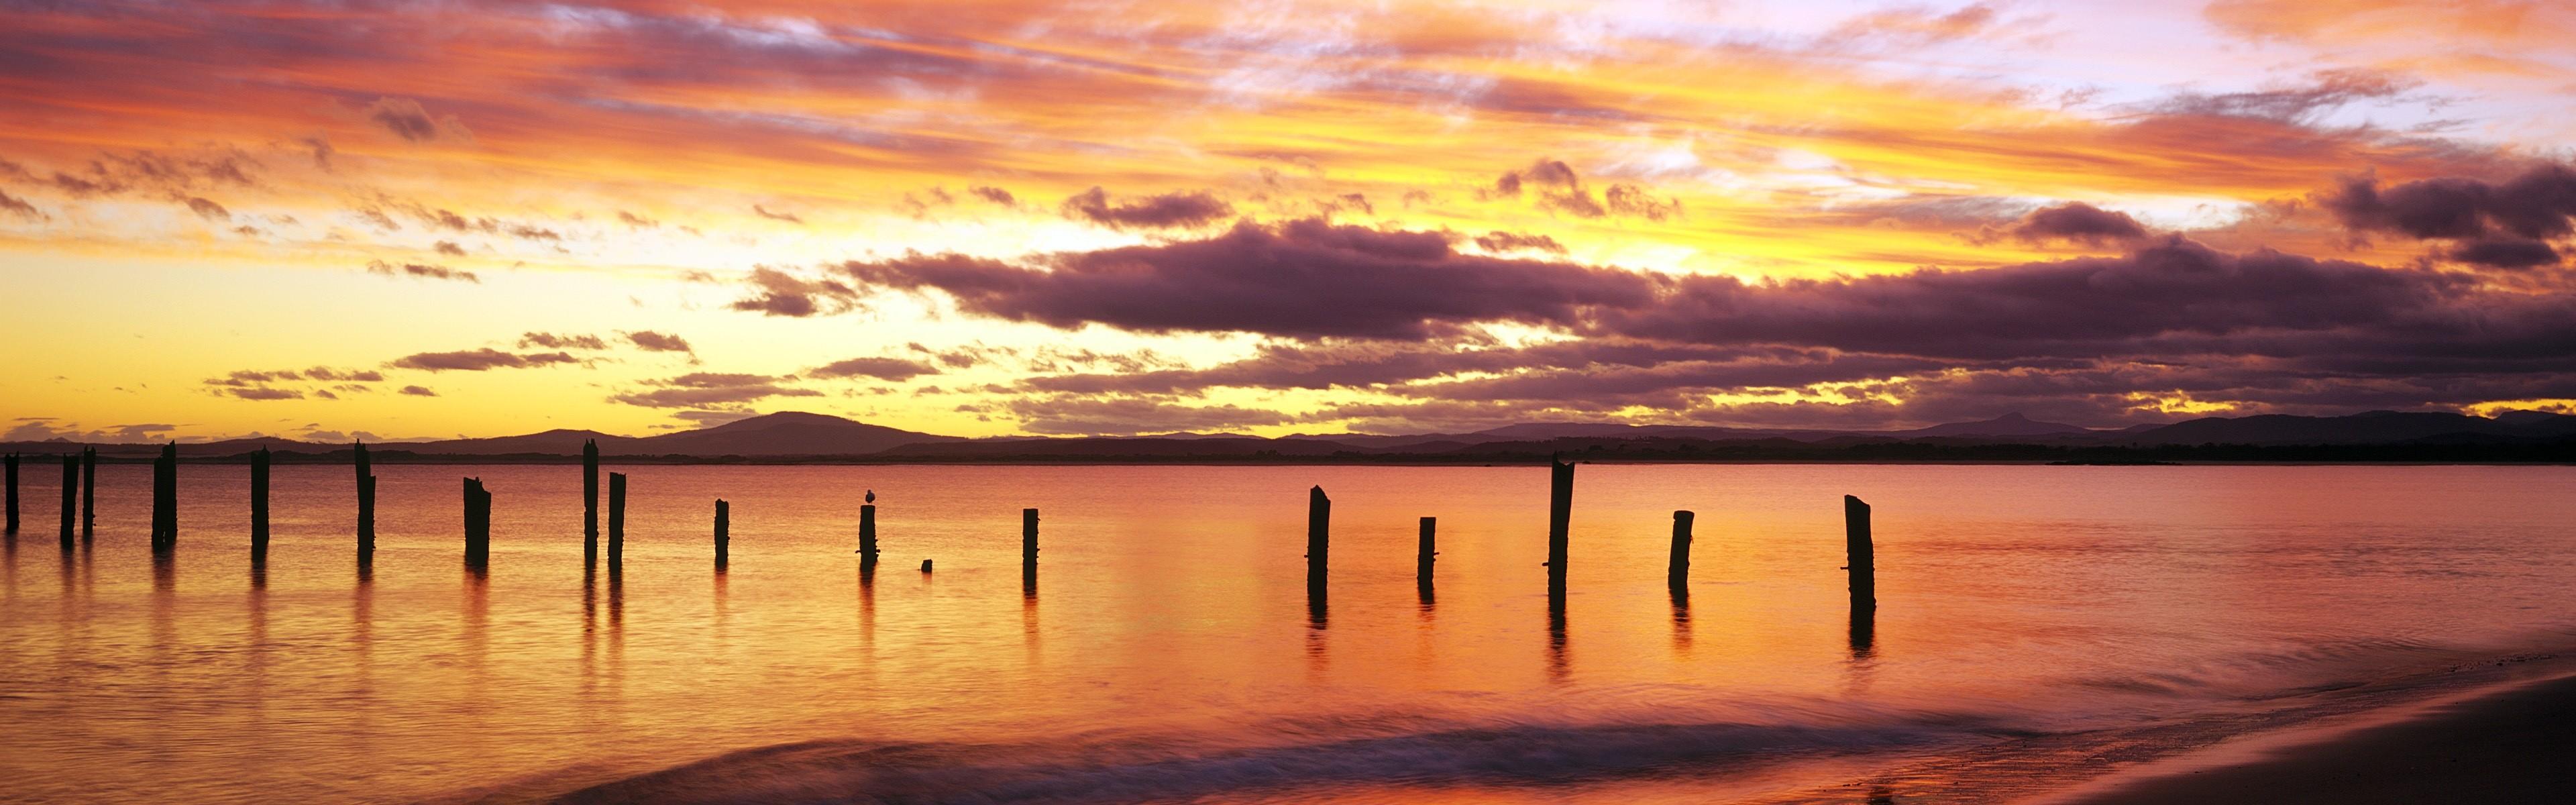 Beautiful beach sunset, Windows 8 panoramic widescreen wallpapers #7 –  3840×1200.